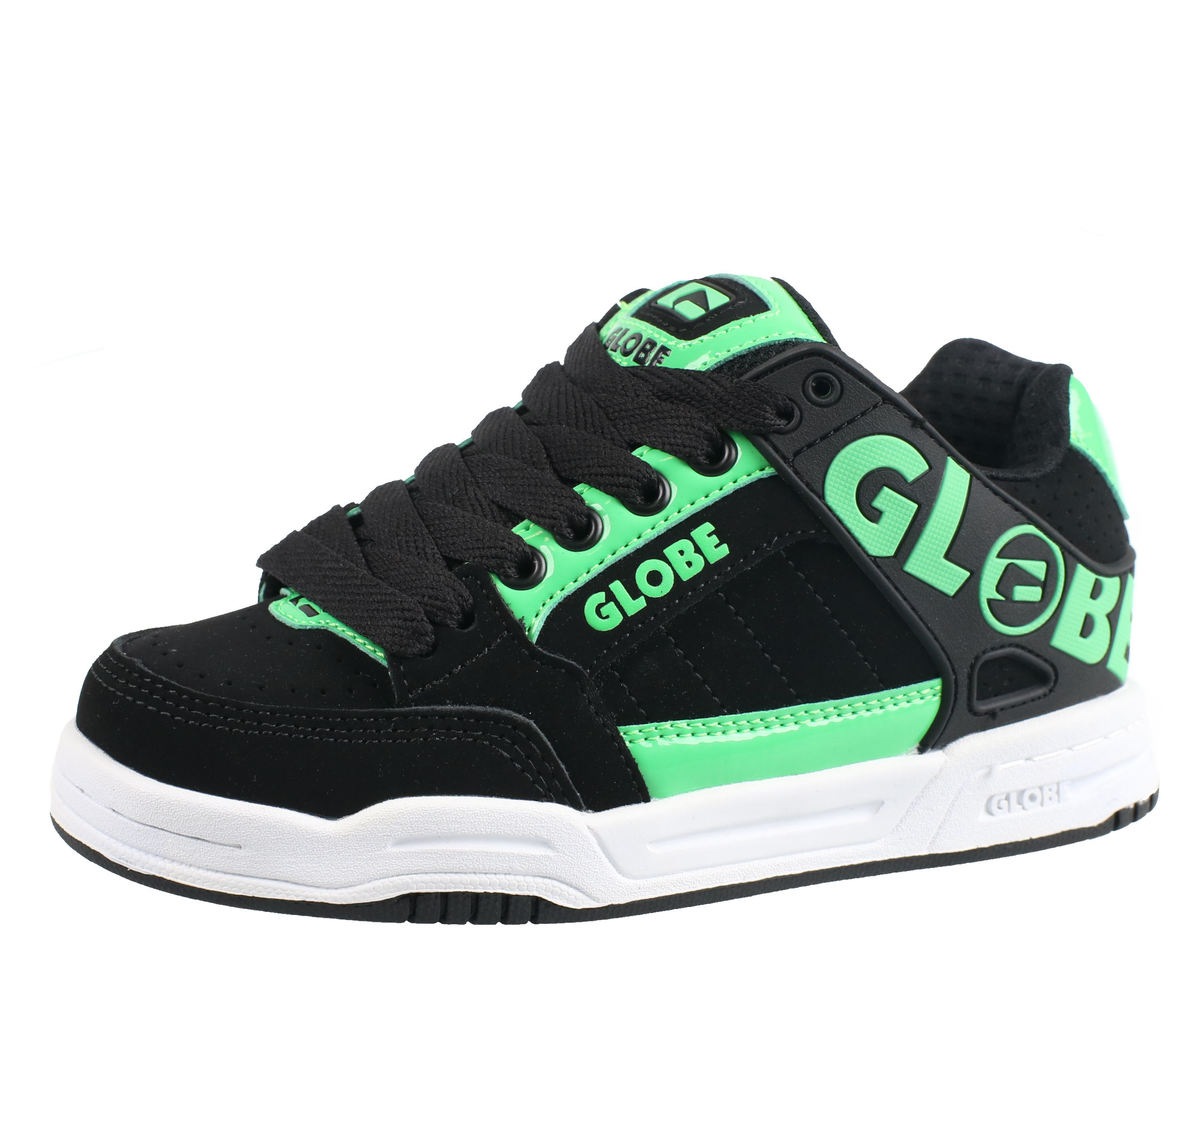 topánky detské GLOBE - Tilt - GBKTILT-19575